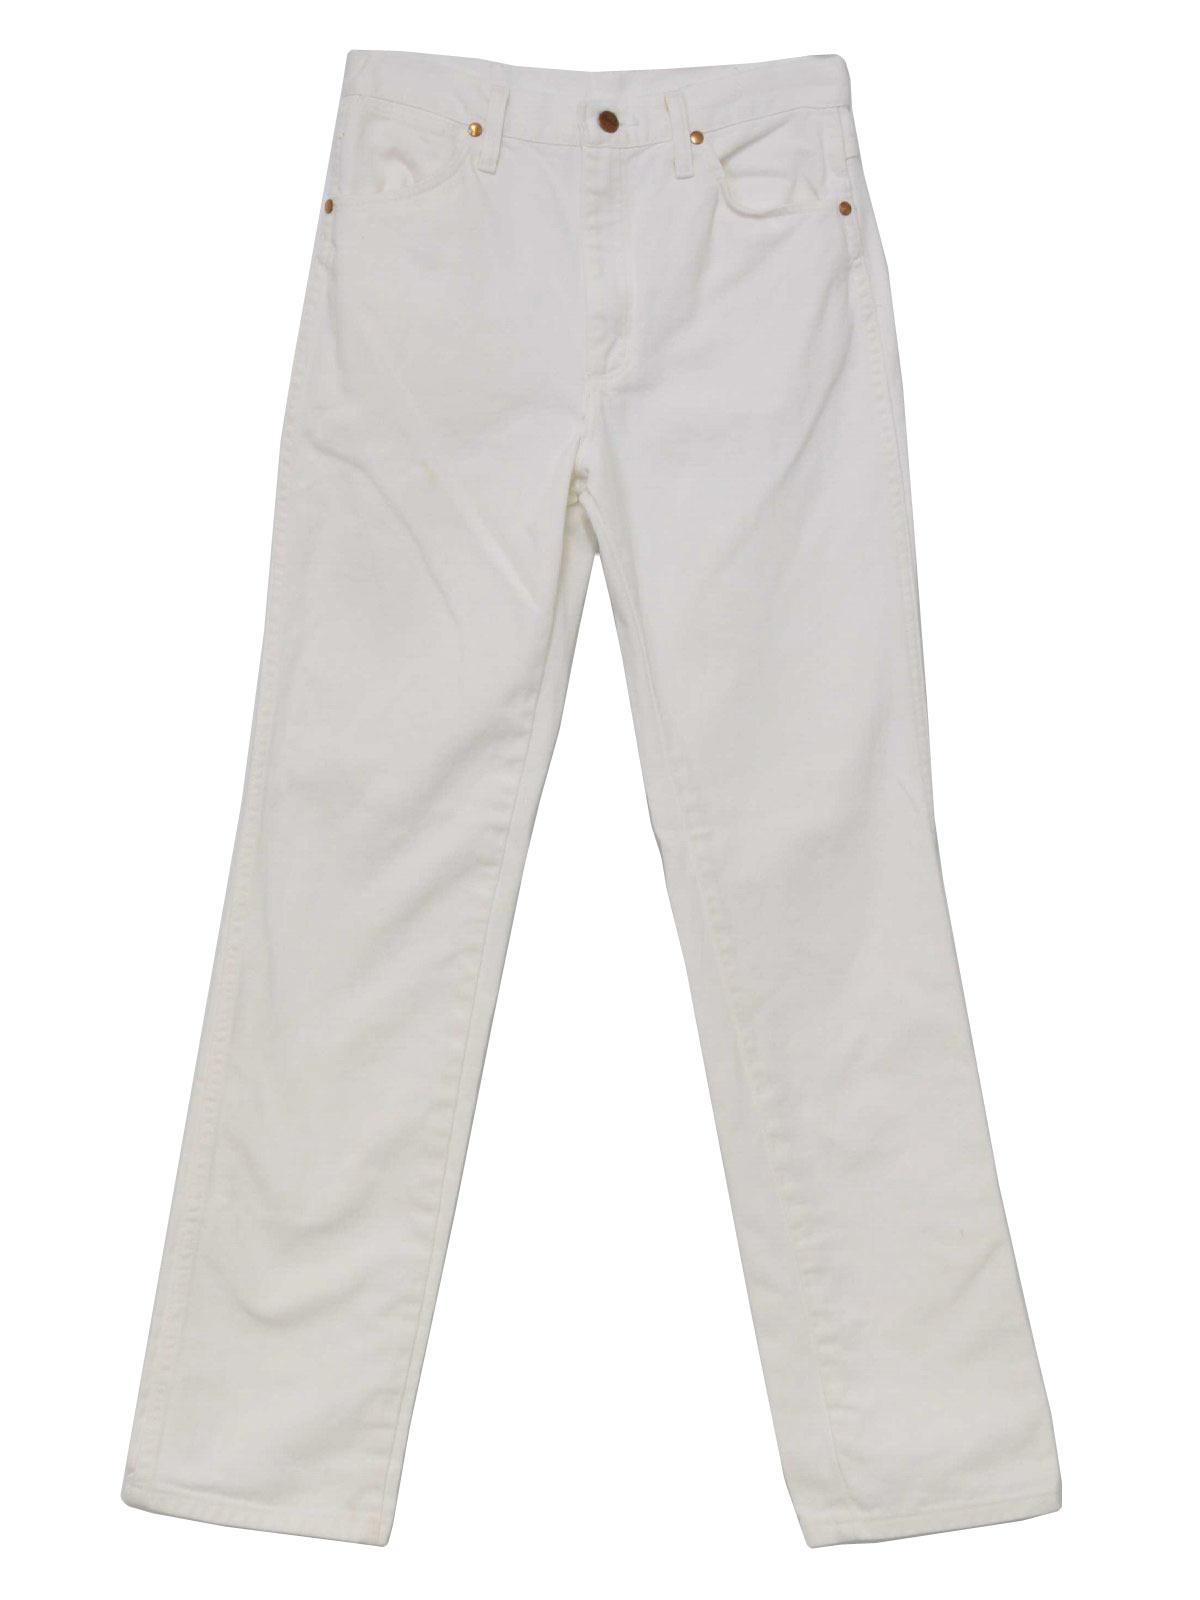 Retro 1980s Pants: 80s -Wrangler- Mens white cotton denim jeans ...